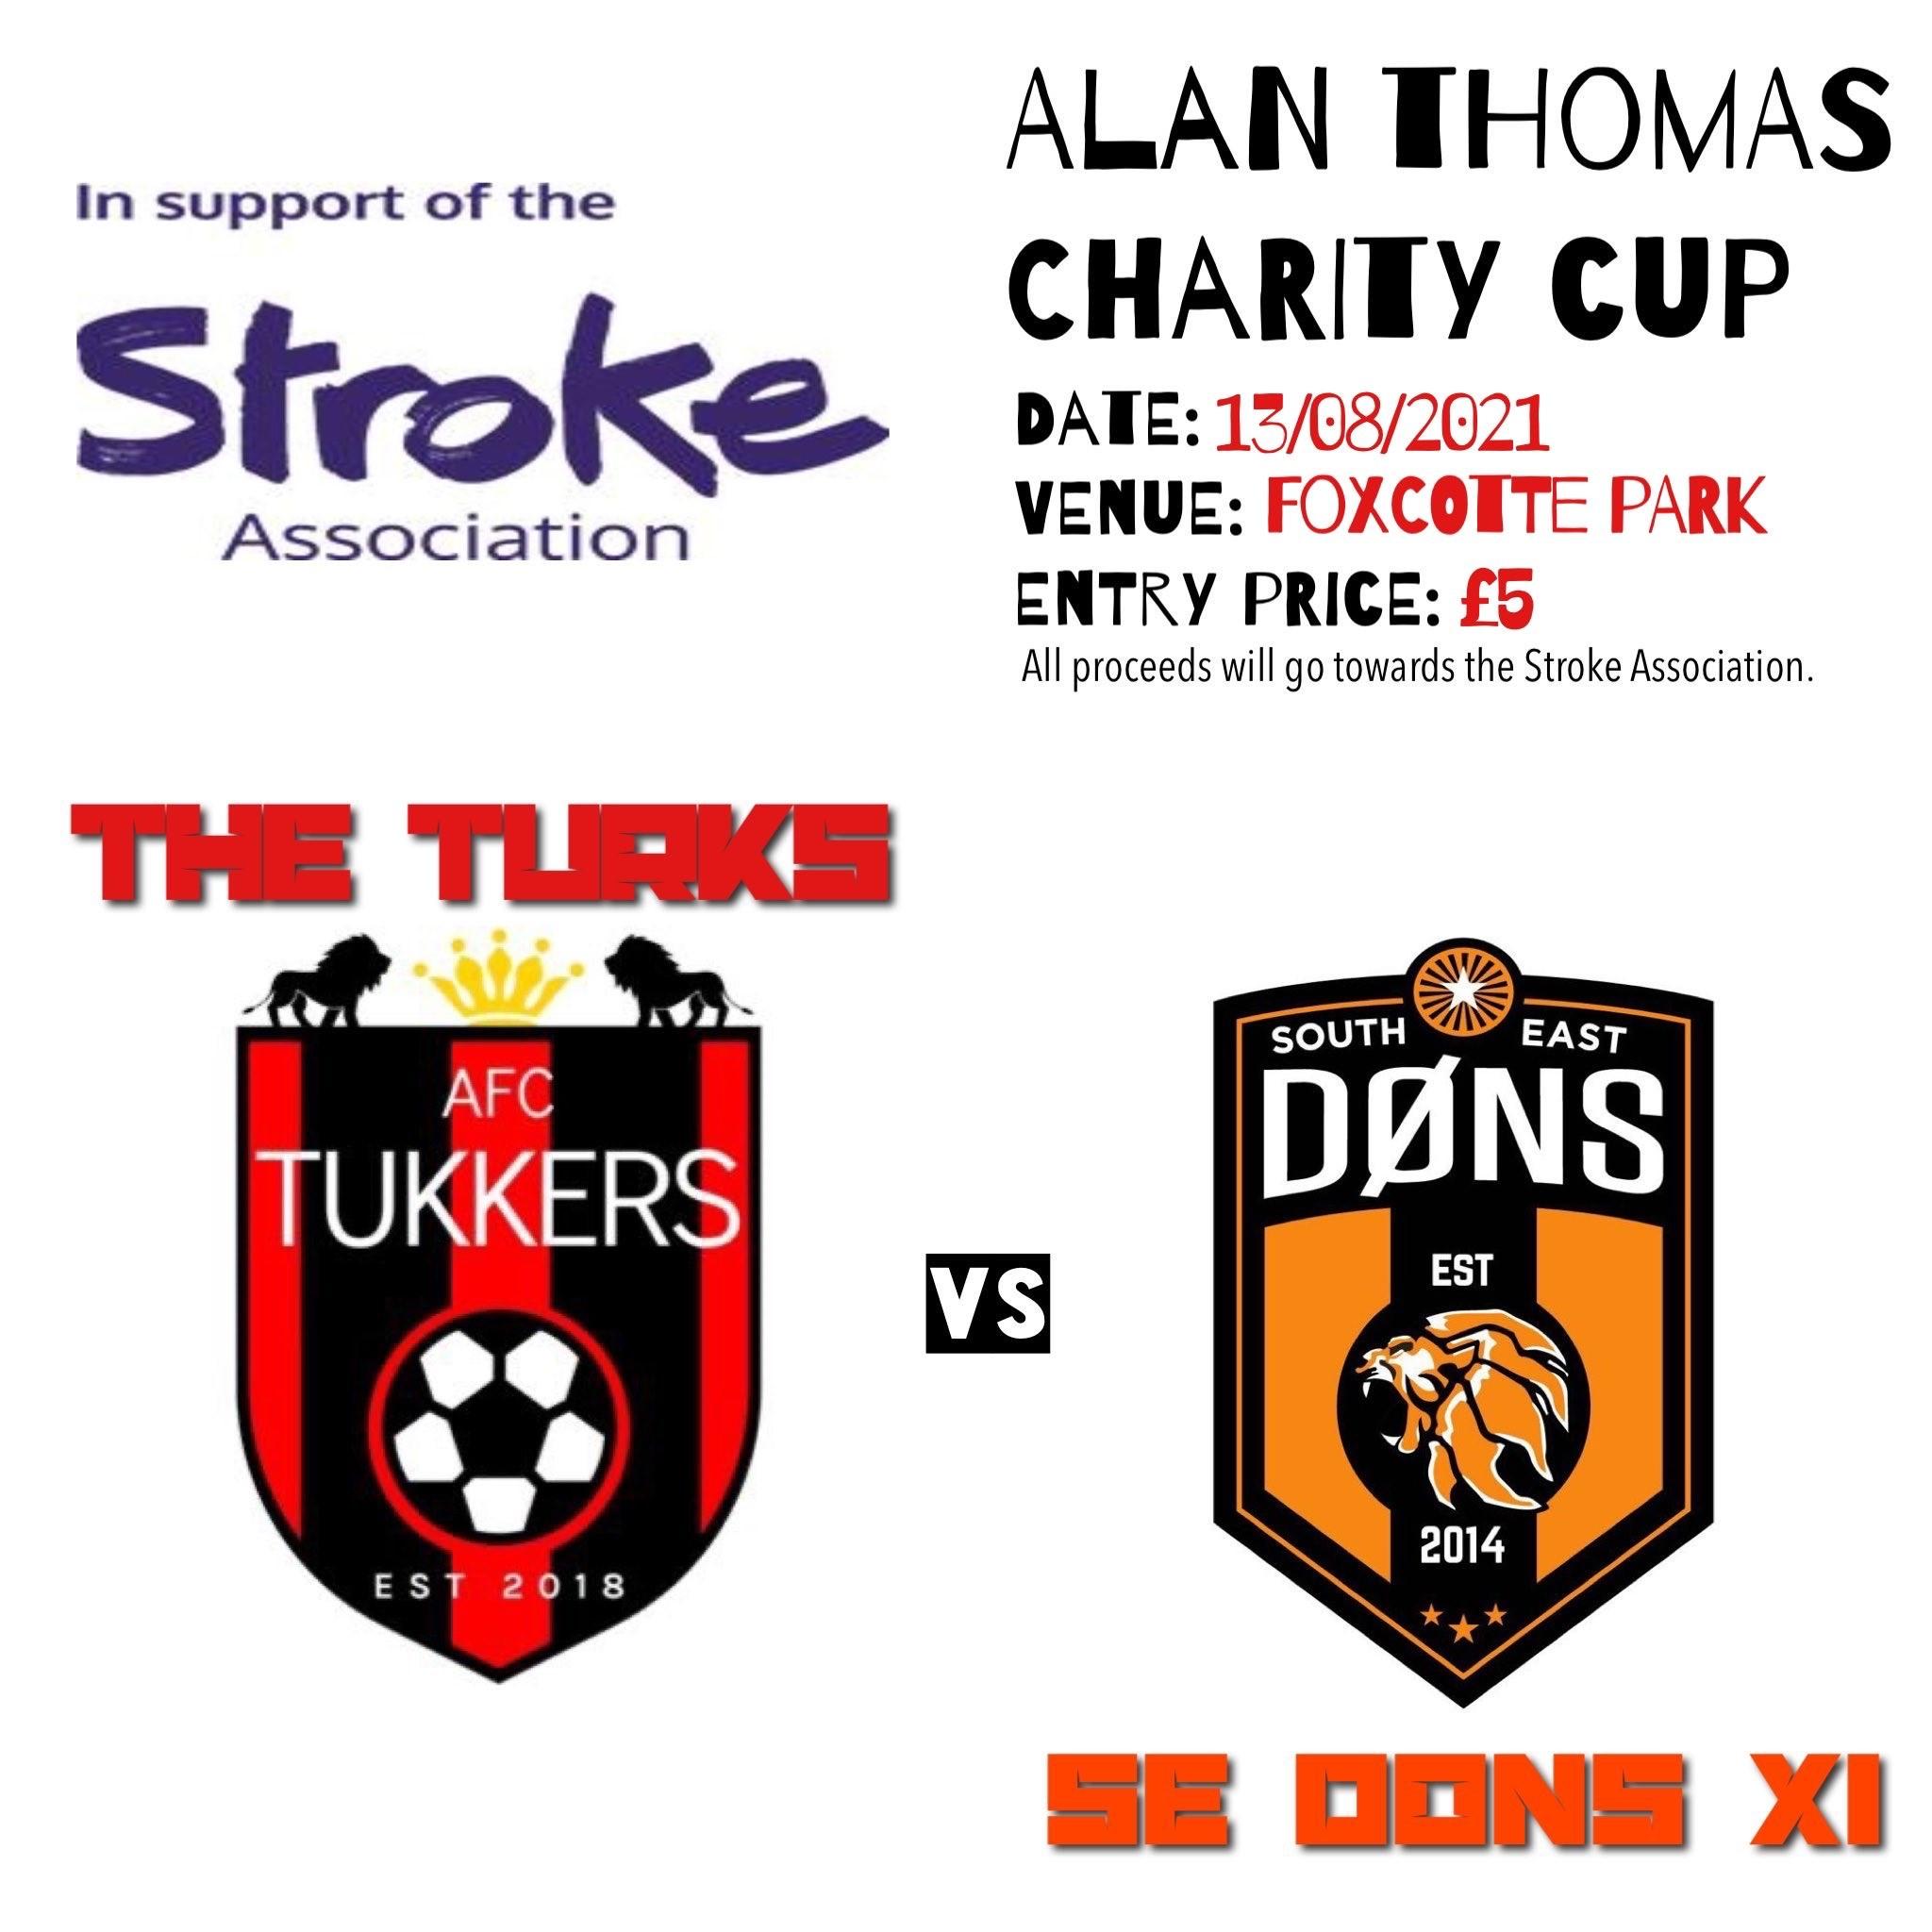 Alan Thomas Charity